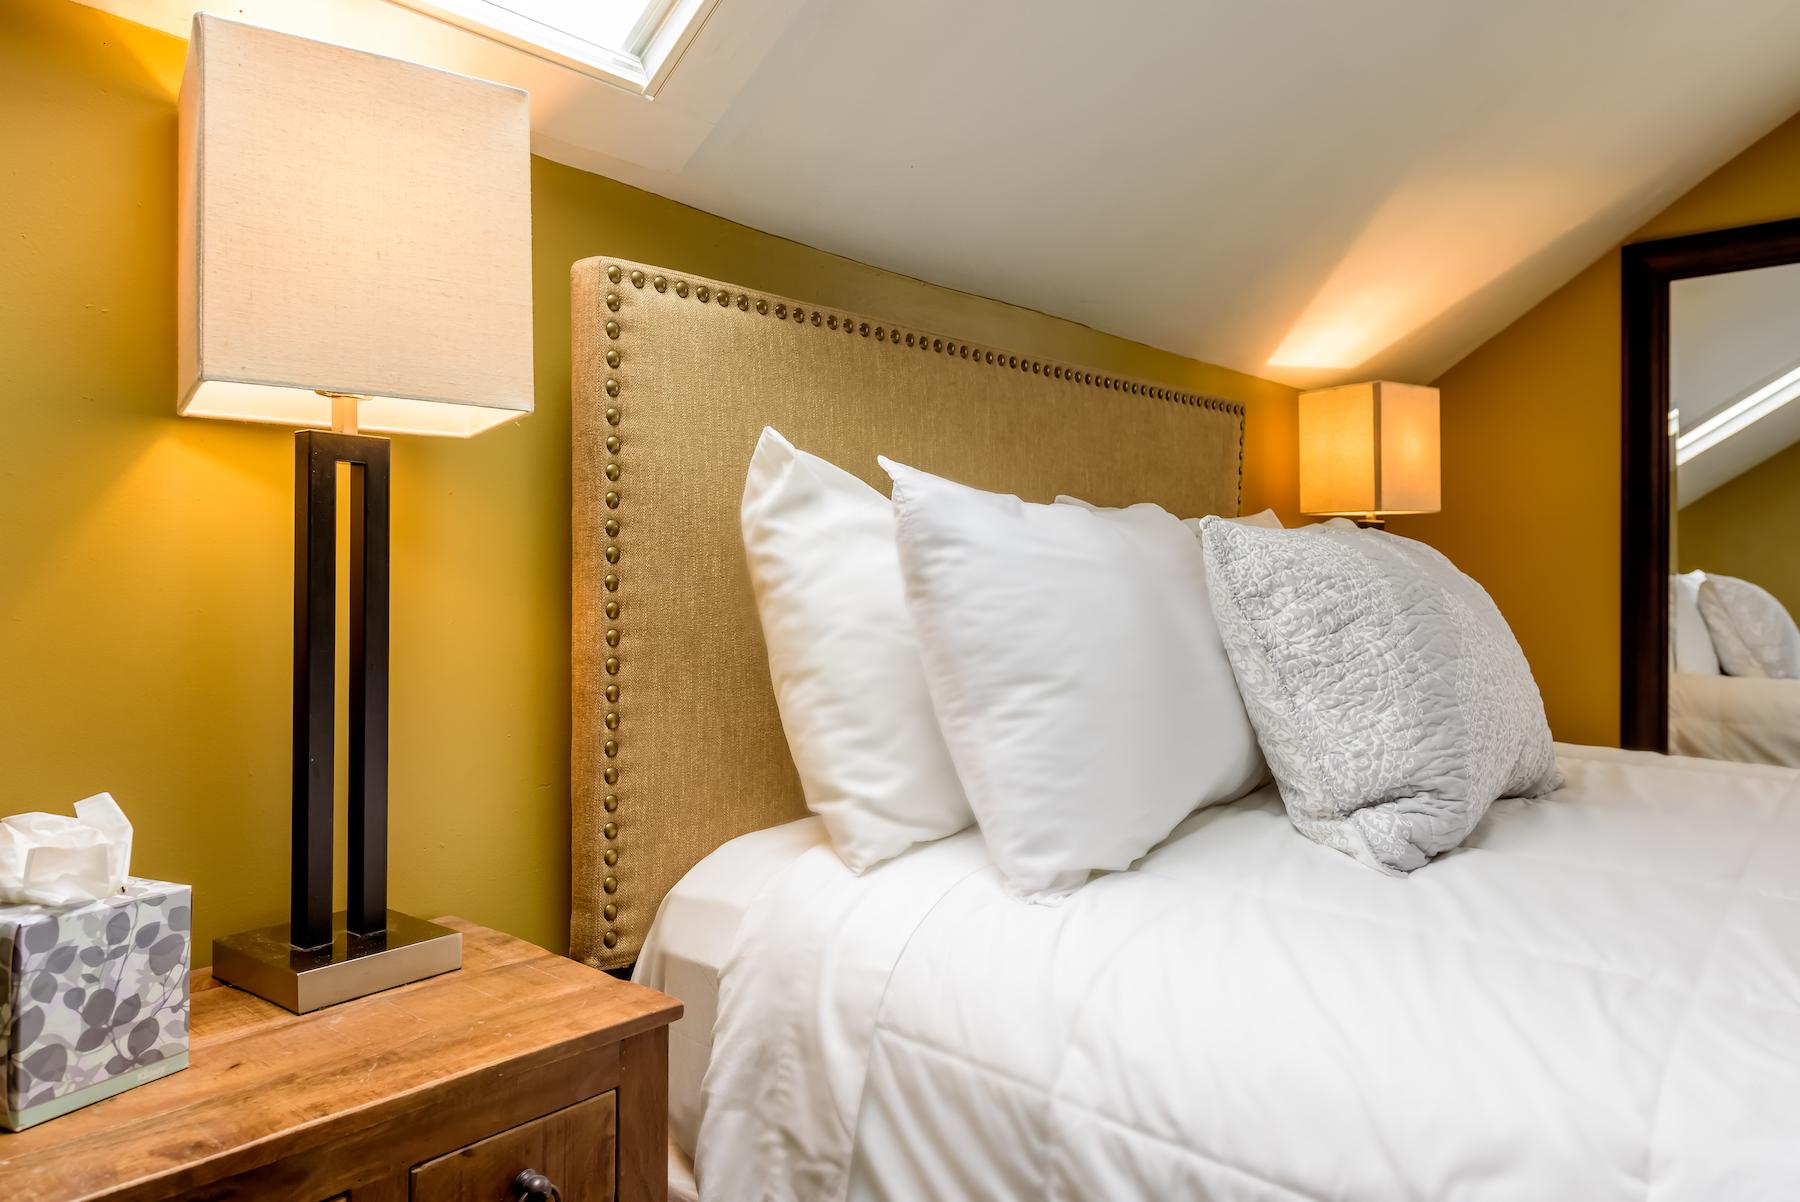 Inn-Room-16-and-Bathrooms-20180419-141-Edit-1